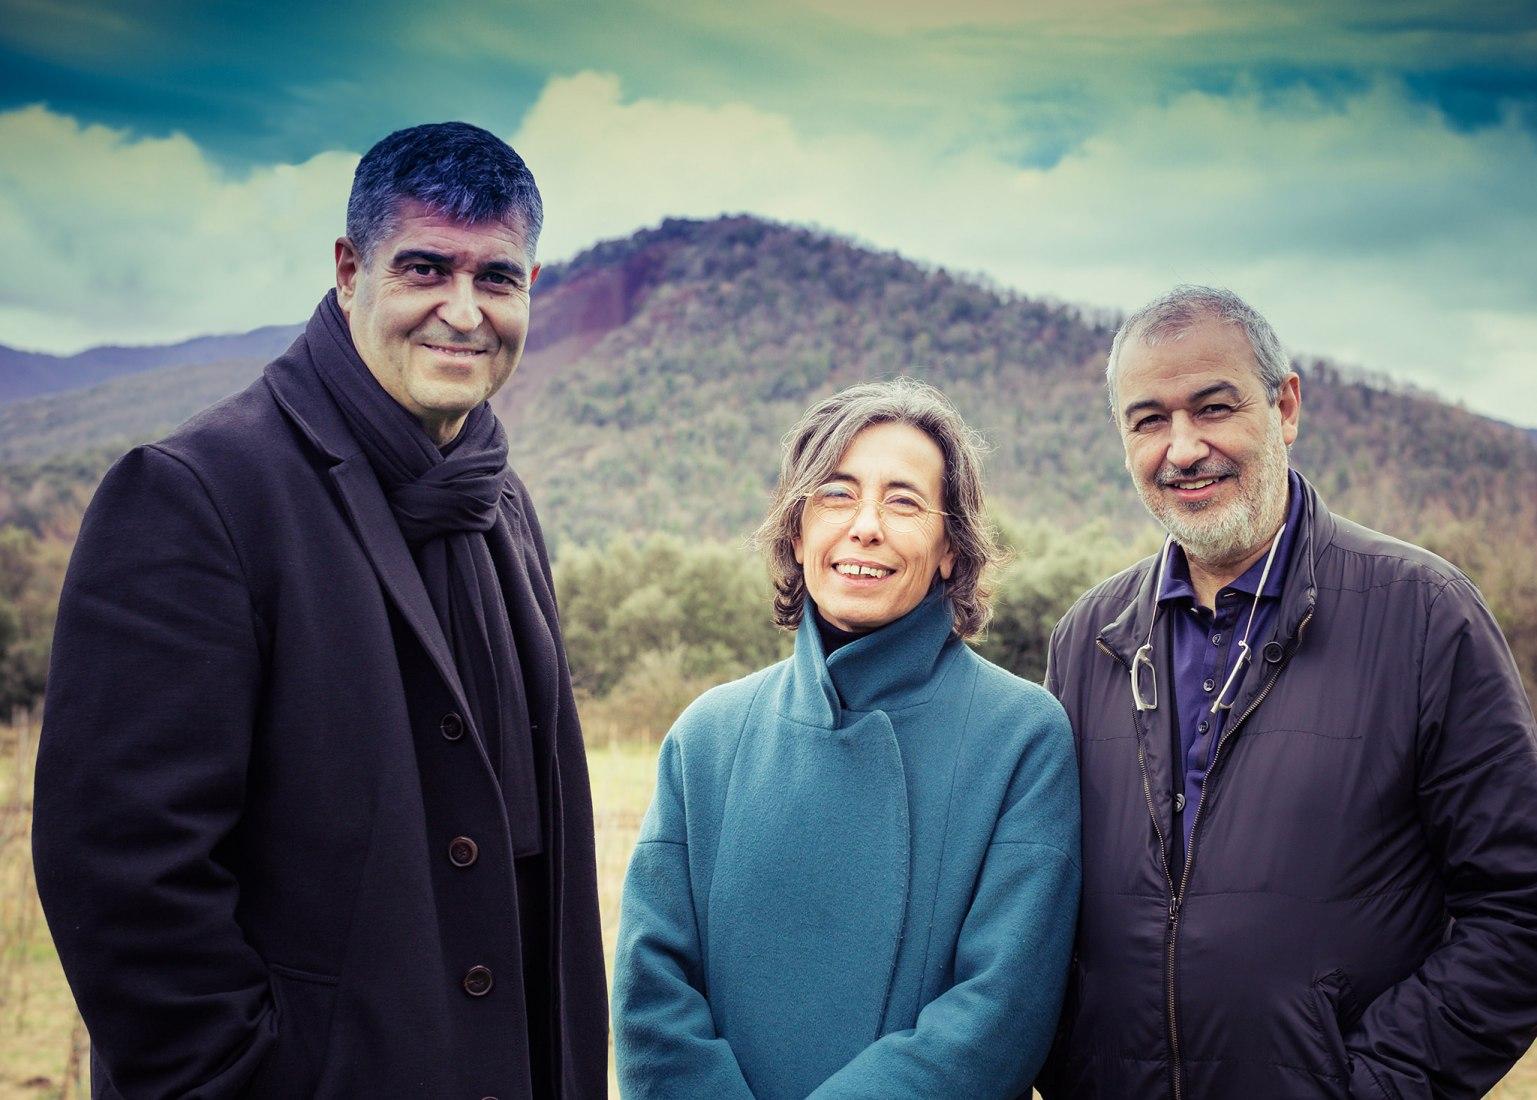 Rafael Aranda, Carme Pigem and Ramón Vilalta. Image courtesy of Pritzker Architecture Prize.